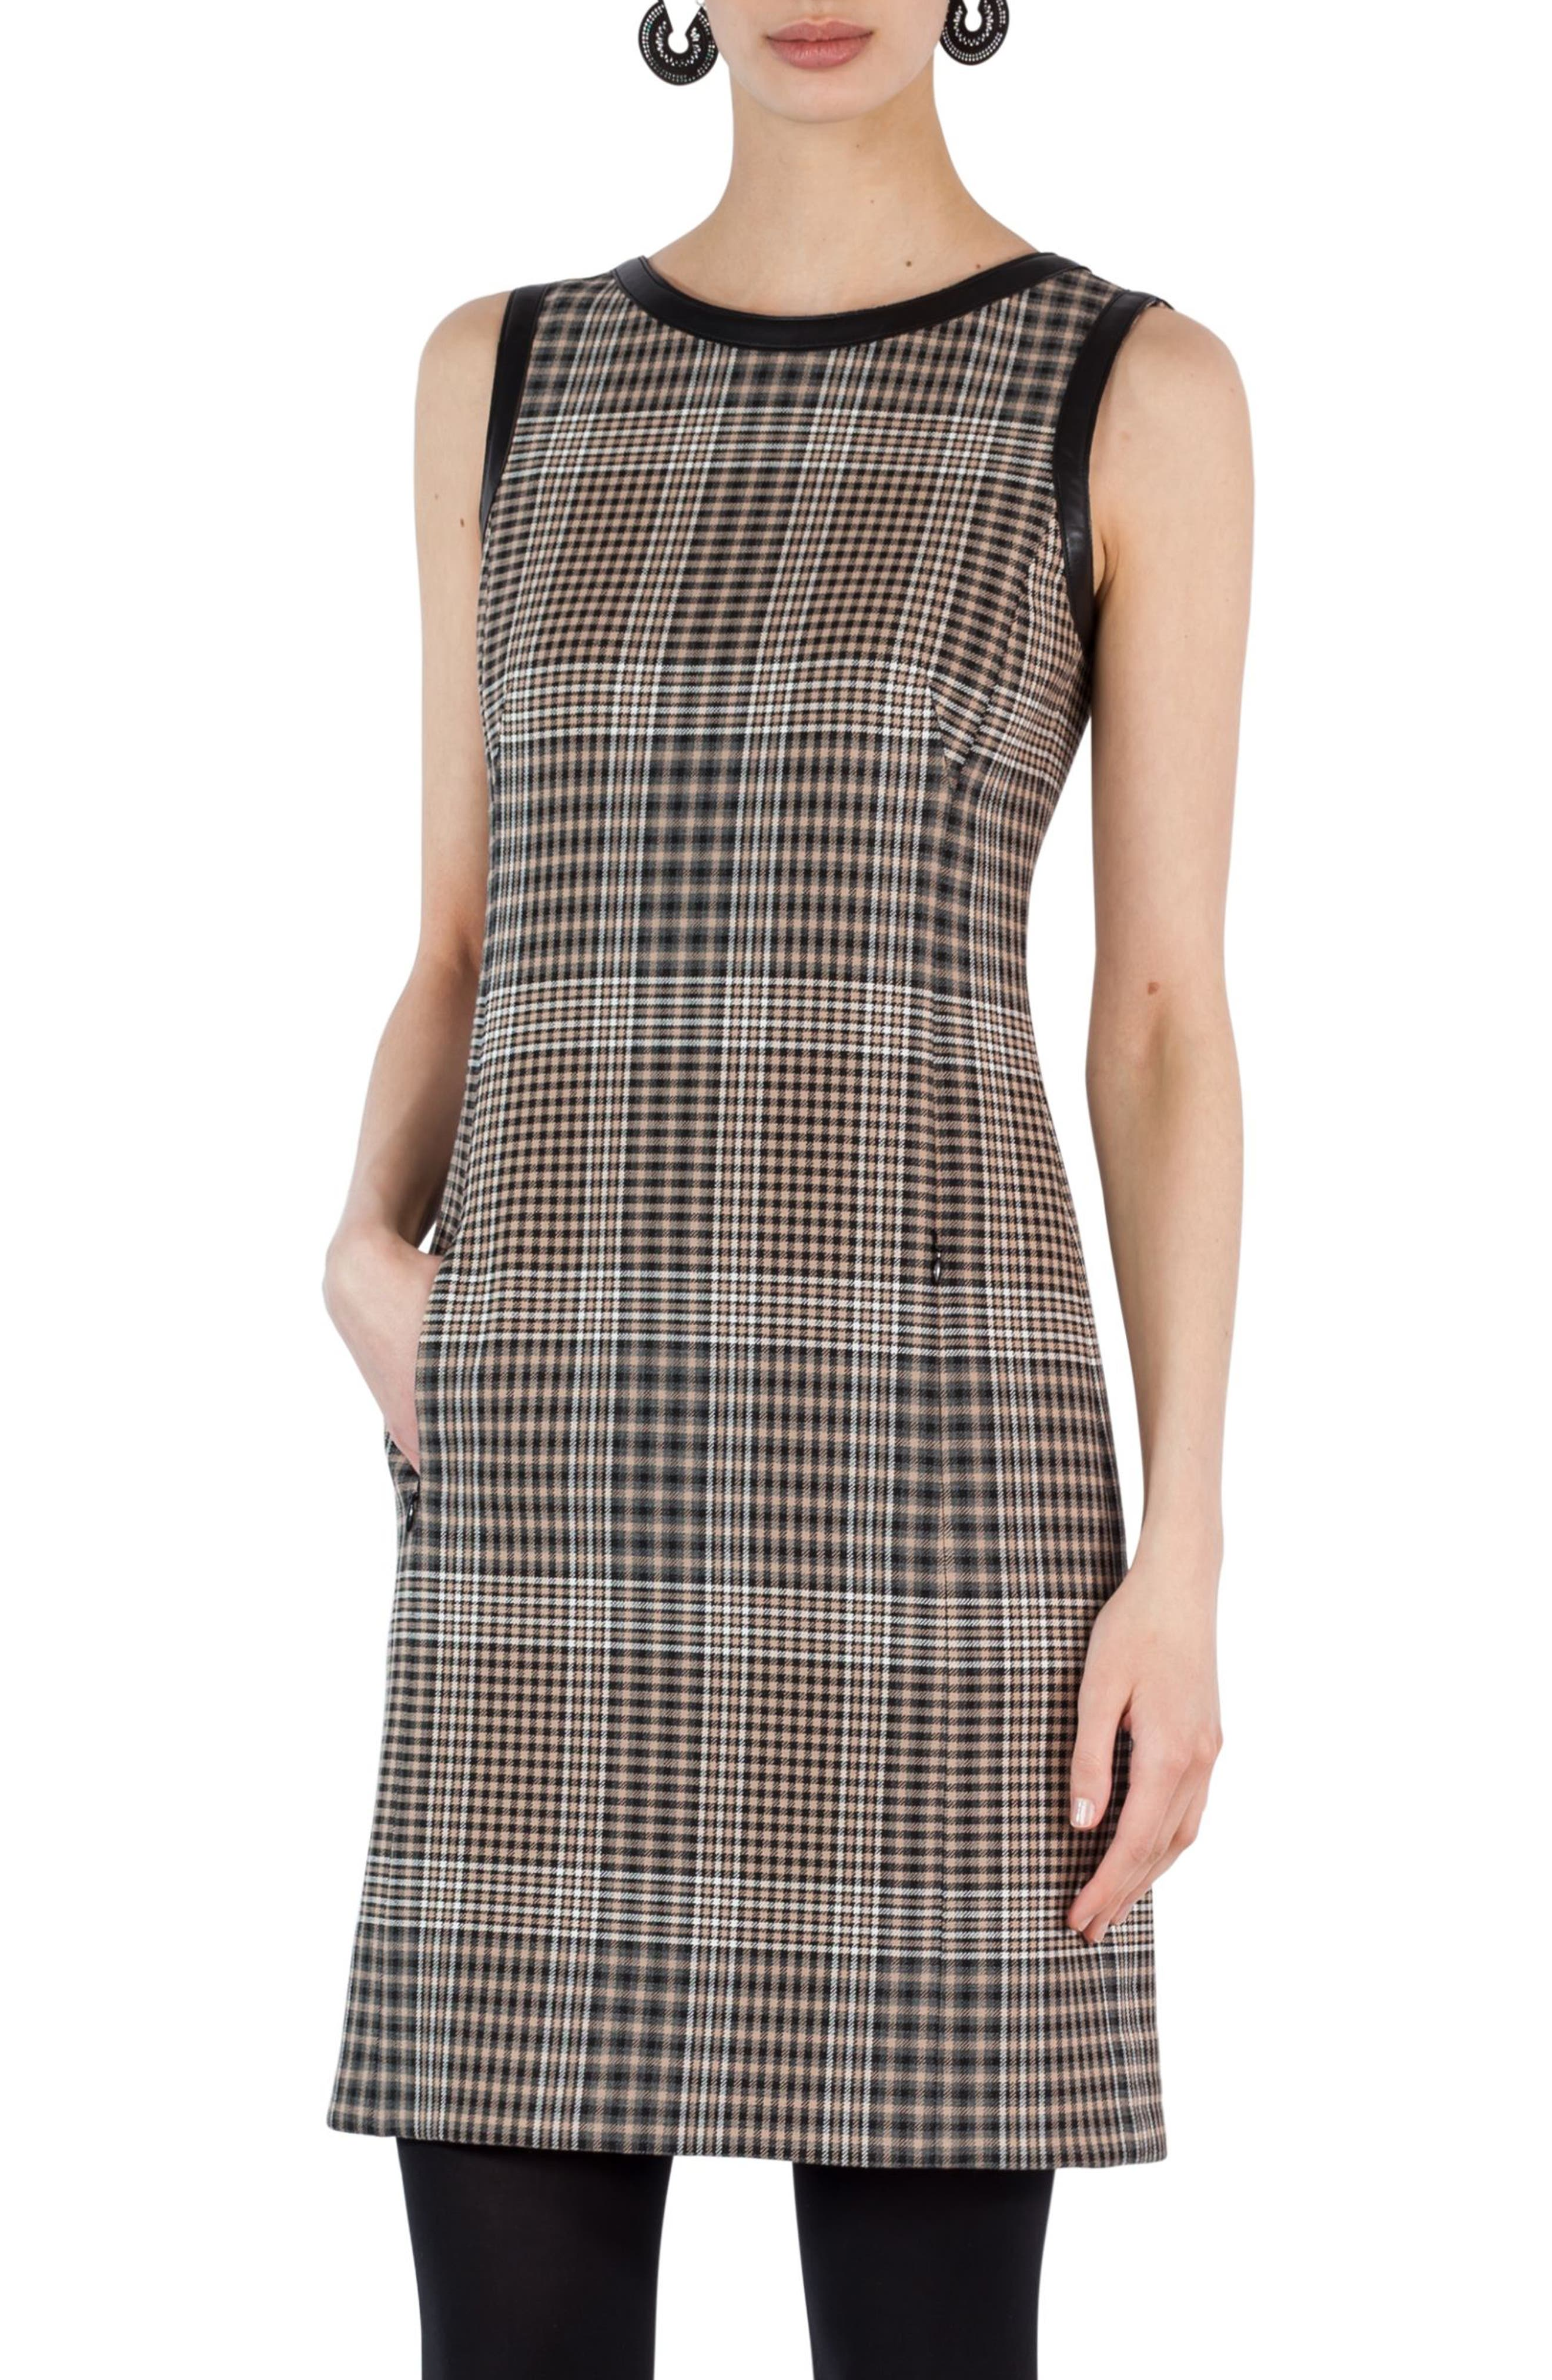 Glen Check Sheath Dress,                         Main,                         color, 200